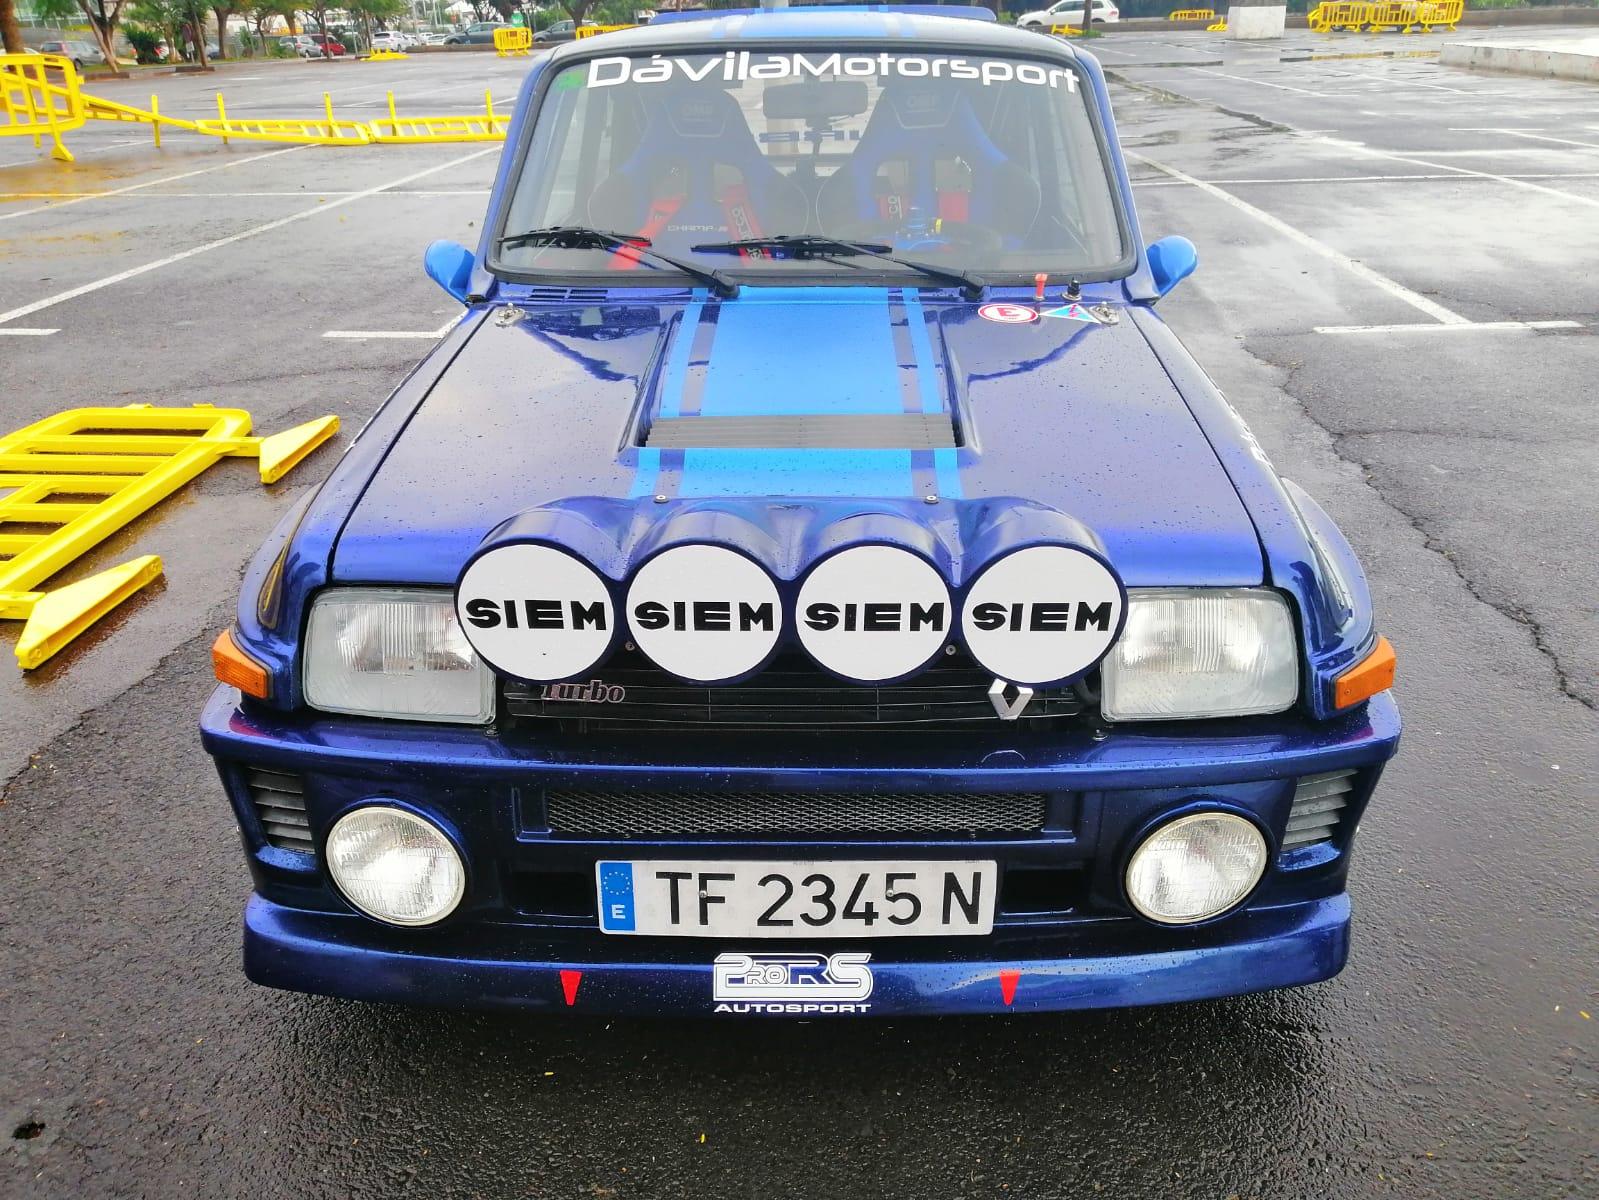 Asientos OMP Champ-R personalizados - Renault 5 Maxi Turbo - Melchor Dávila